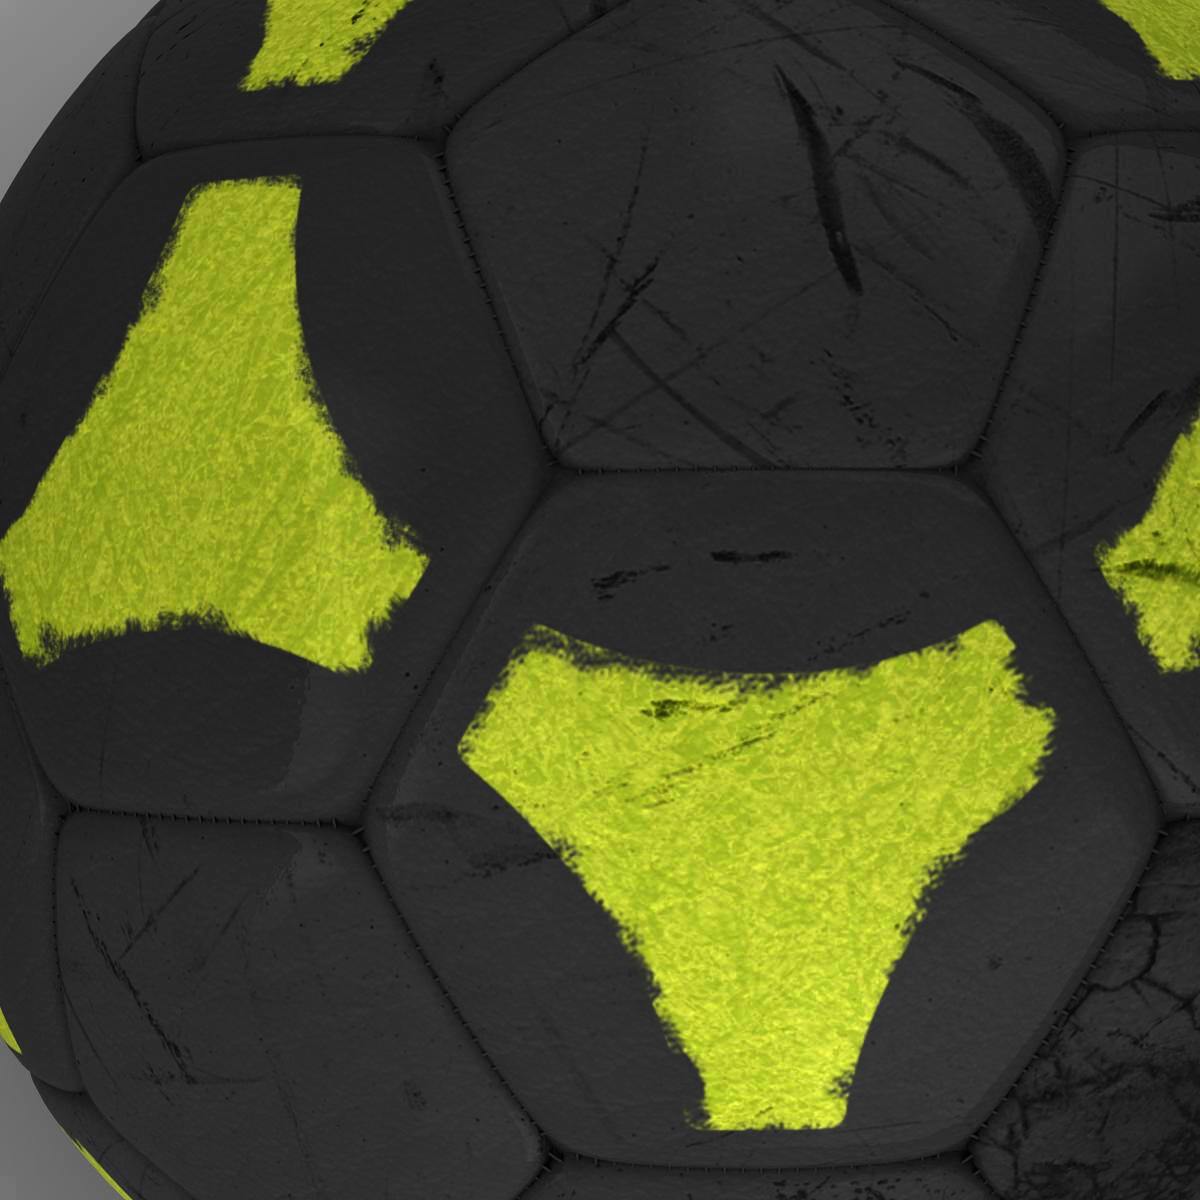 soccerball хар шар 3d загвар 3ds max fbx c4d ma mb obj 204208